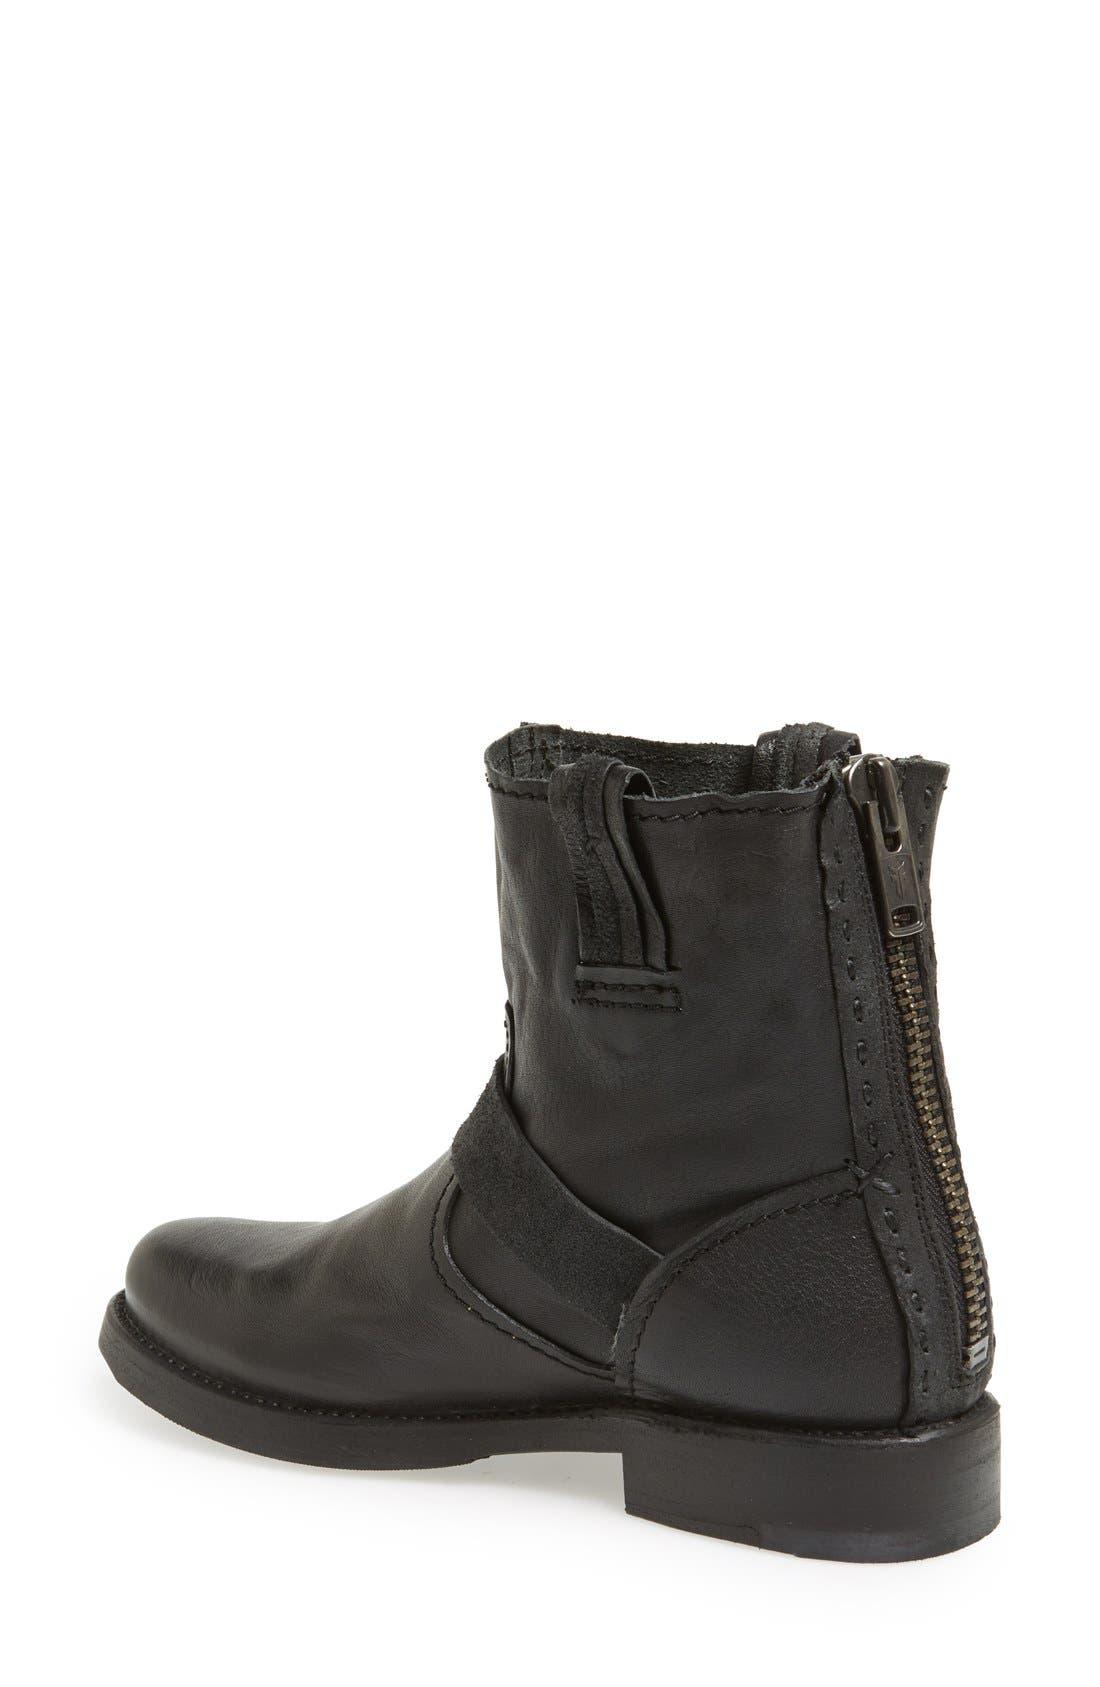 Alternate Image 2  - Frye 'Vicky Artisan' Back Zip Boot (Women)